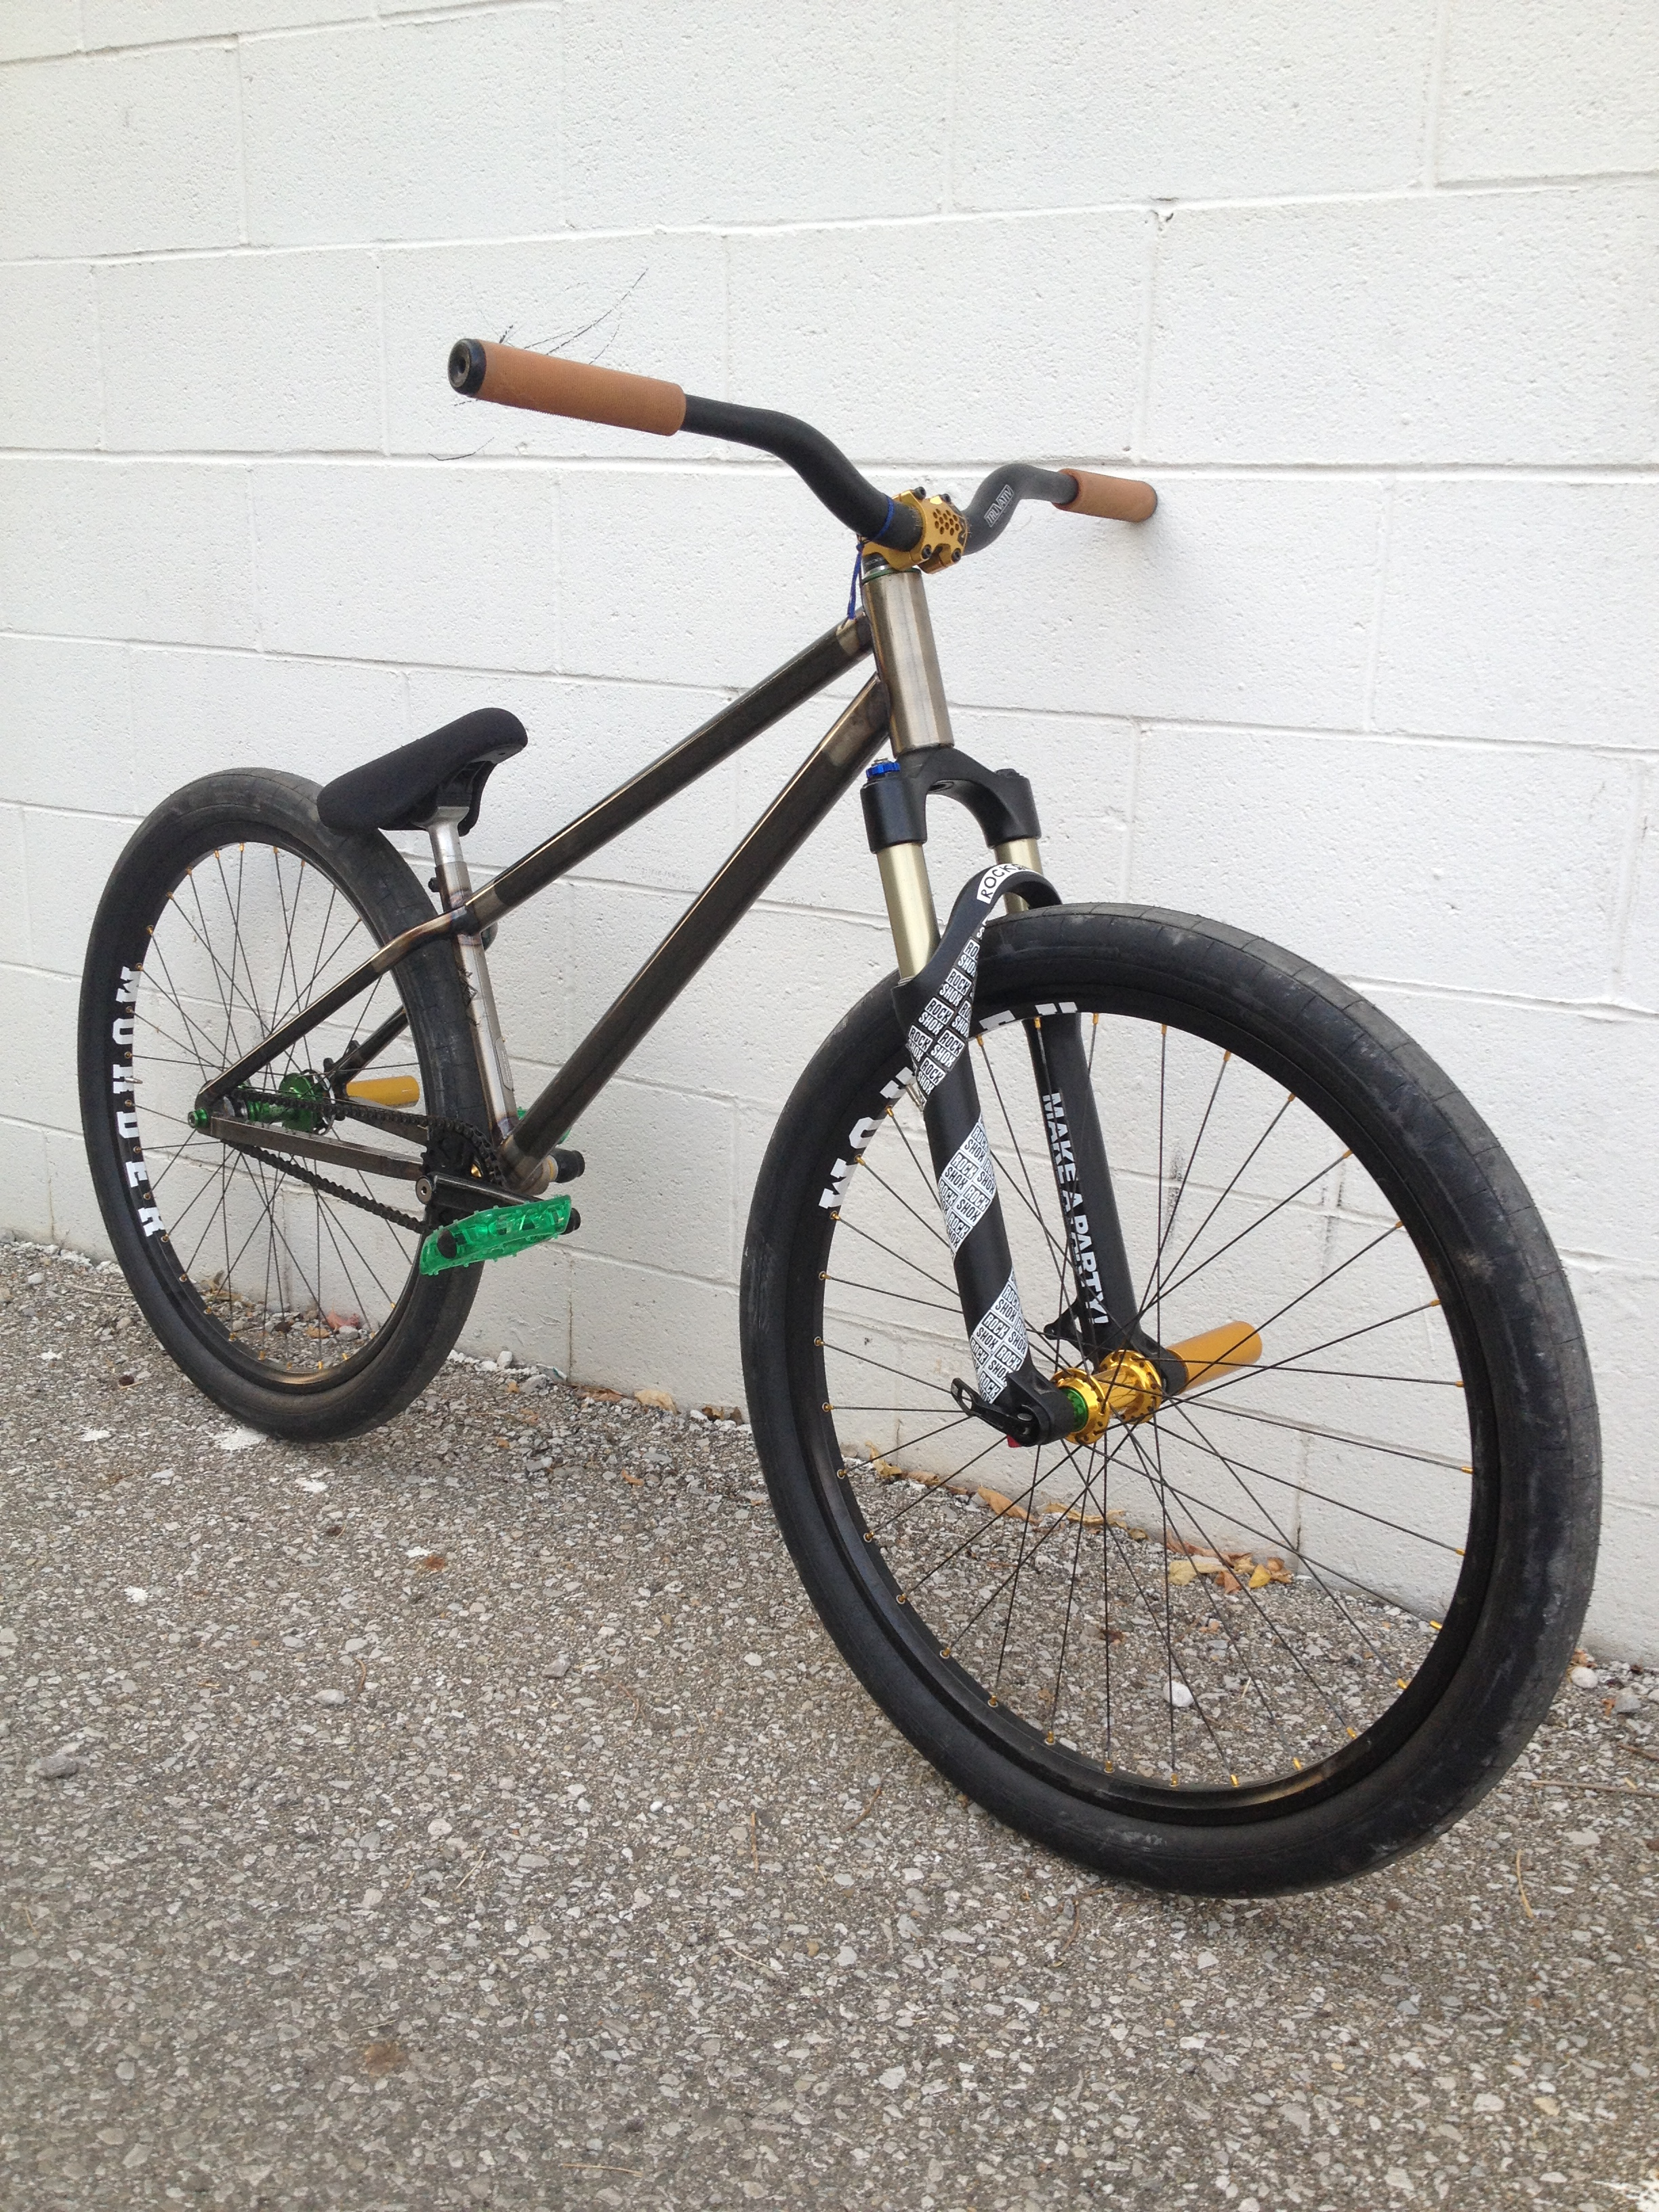 ORDNANCE BIKES STREET SETUP - midwestXmike's Bike Check - Vital MTB